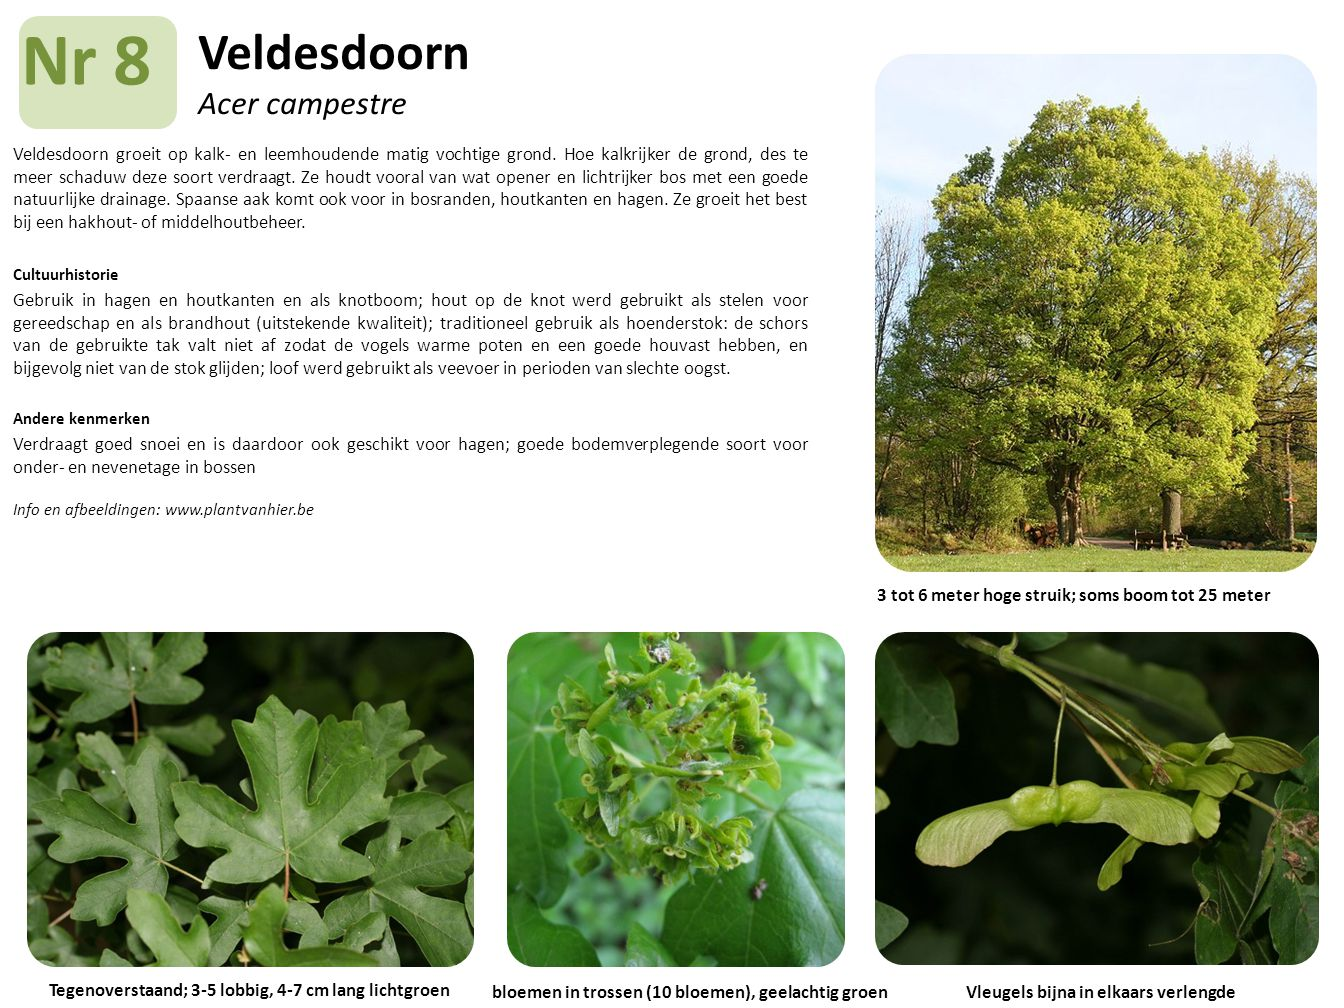 Veldesdoorn Acer campestre